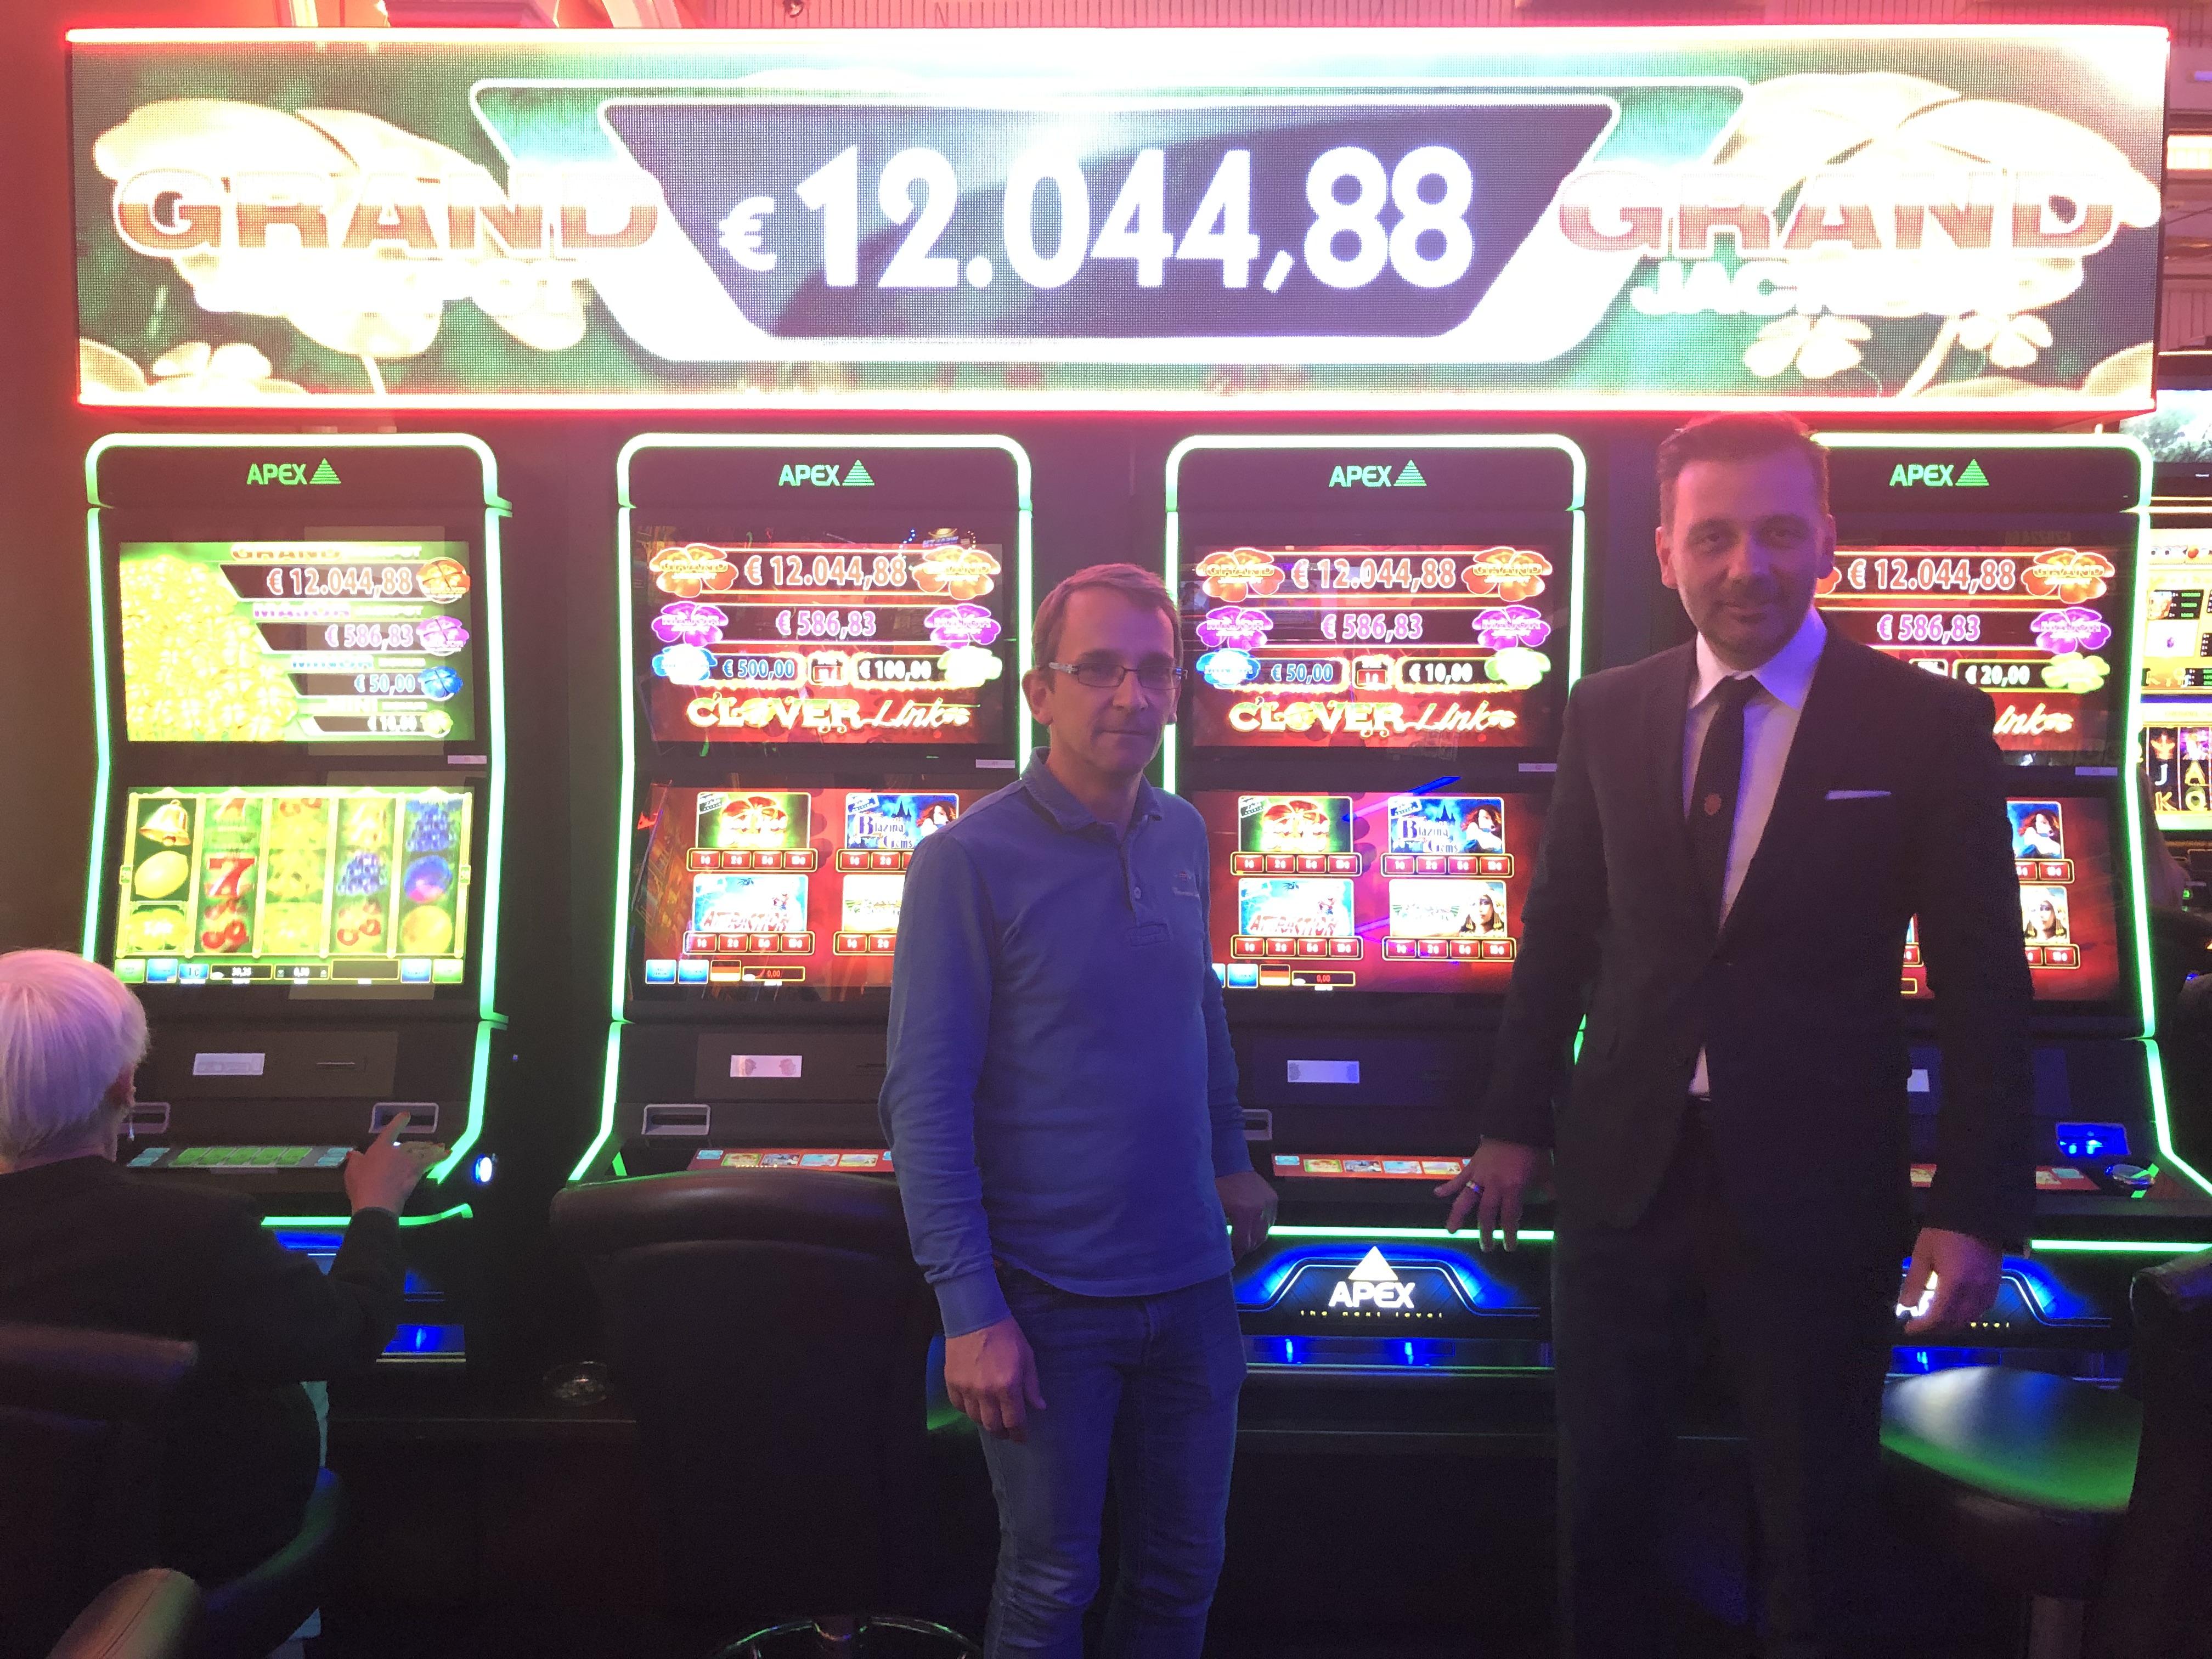 Casino News Clover Link In Historic German Casino